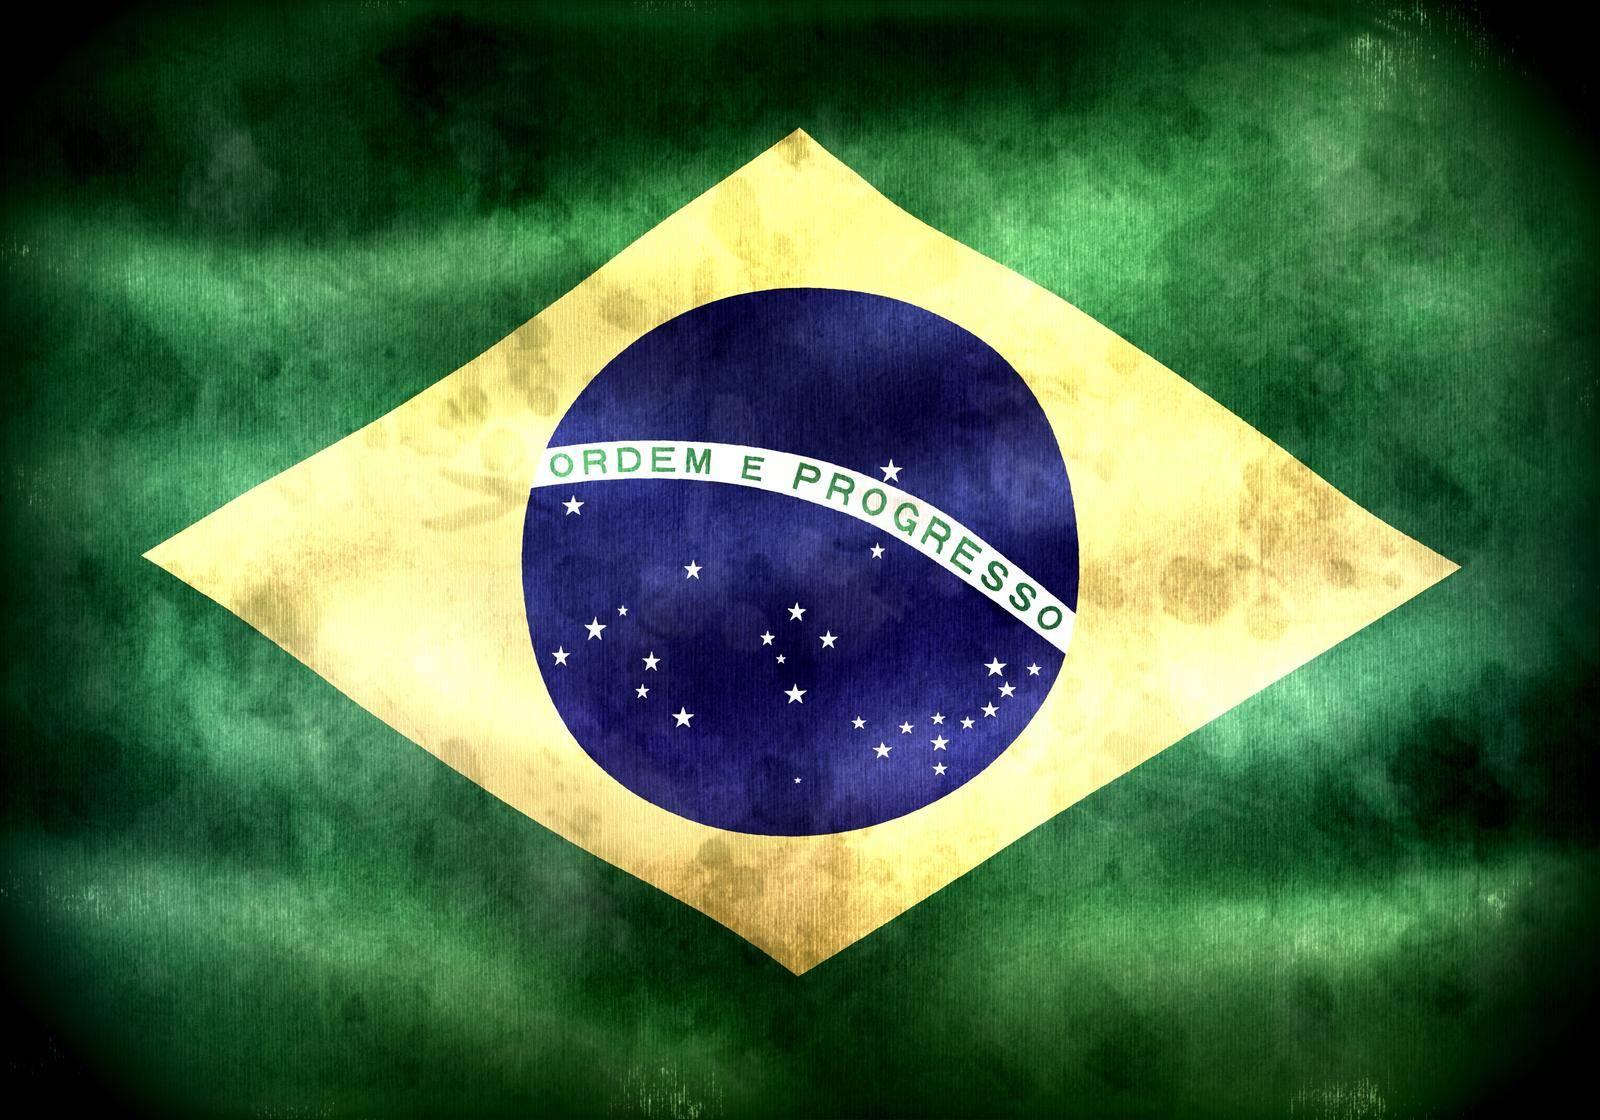 Brazil, official, wind, waving, vote, population - D37212450